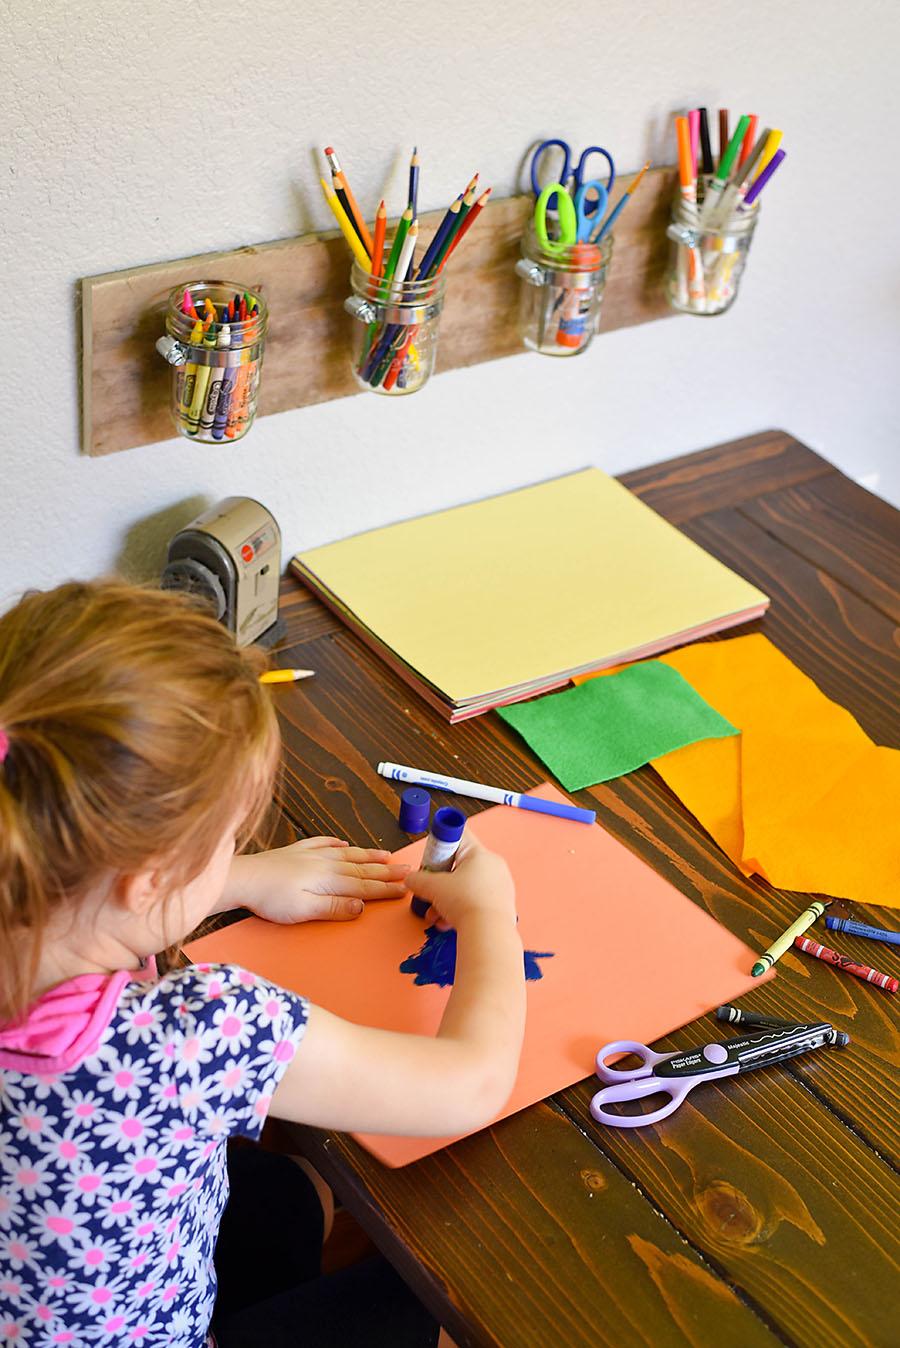 Art Station - DIY Mason Jar Art Supply Organizer - Our Handcrafted Life